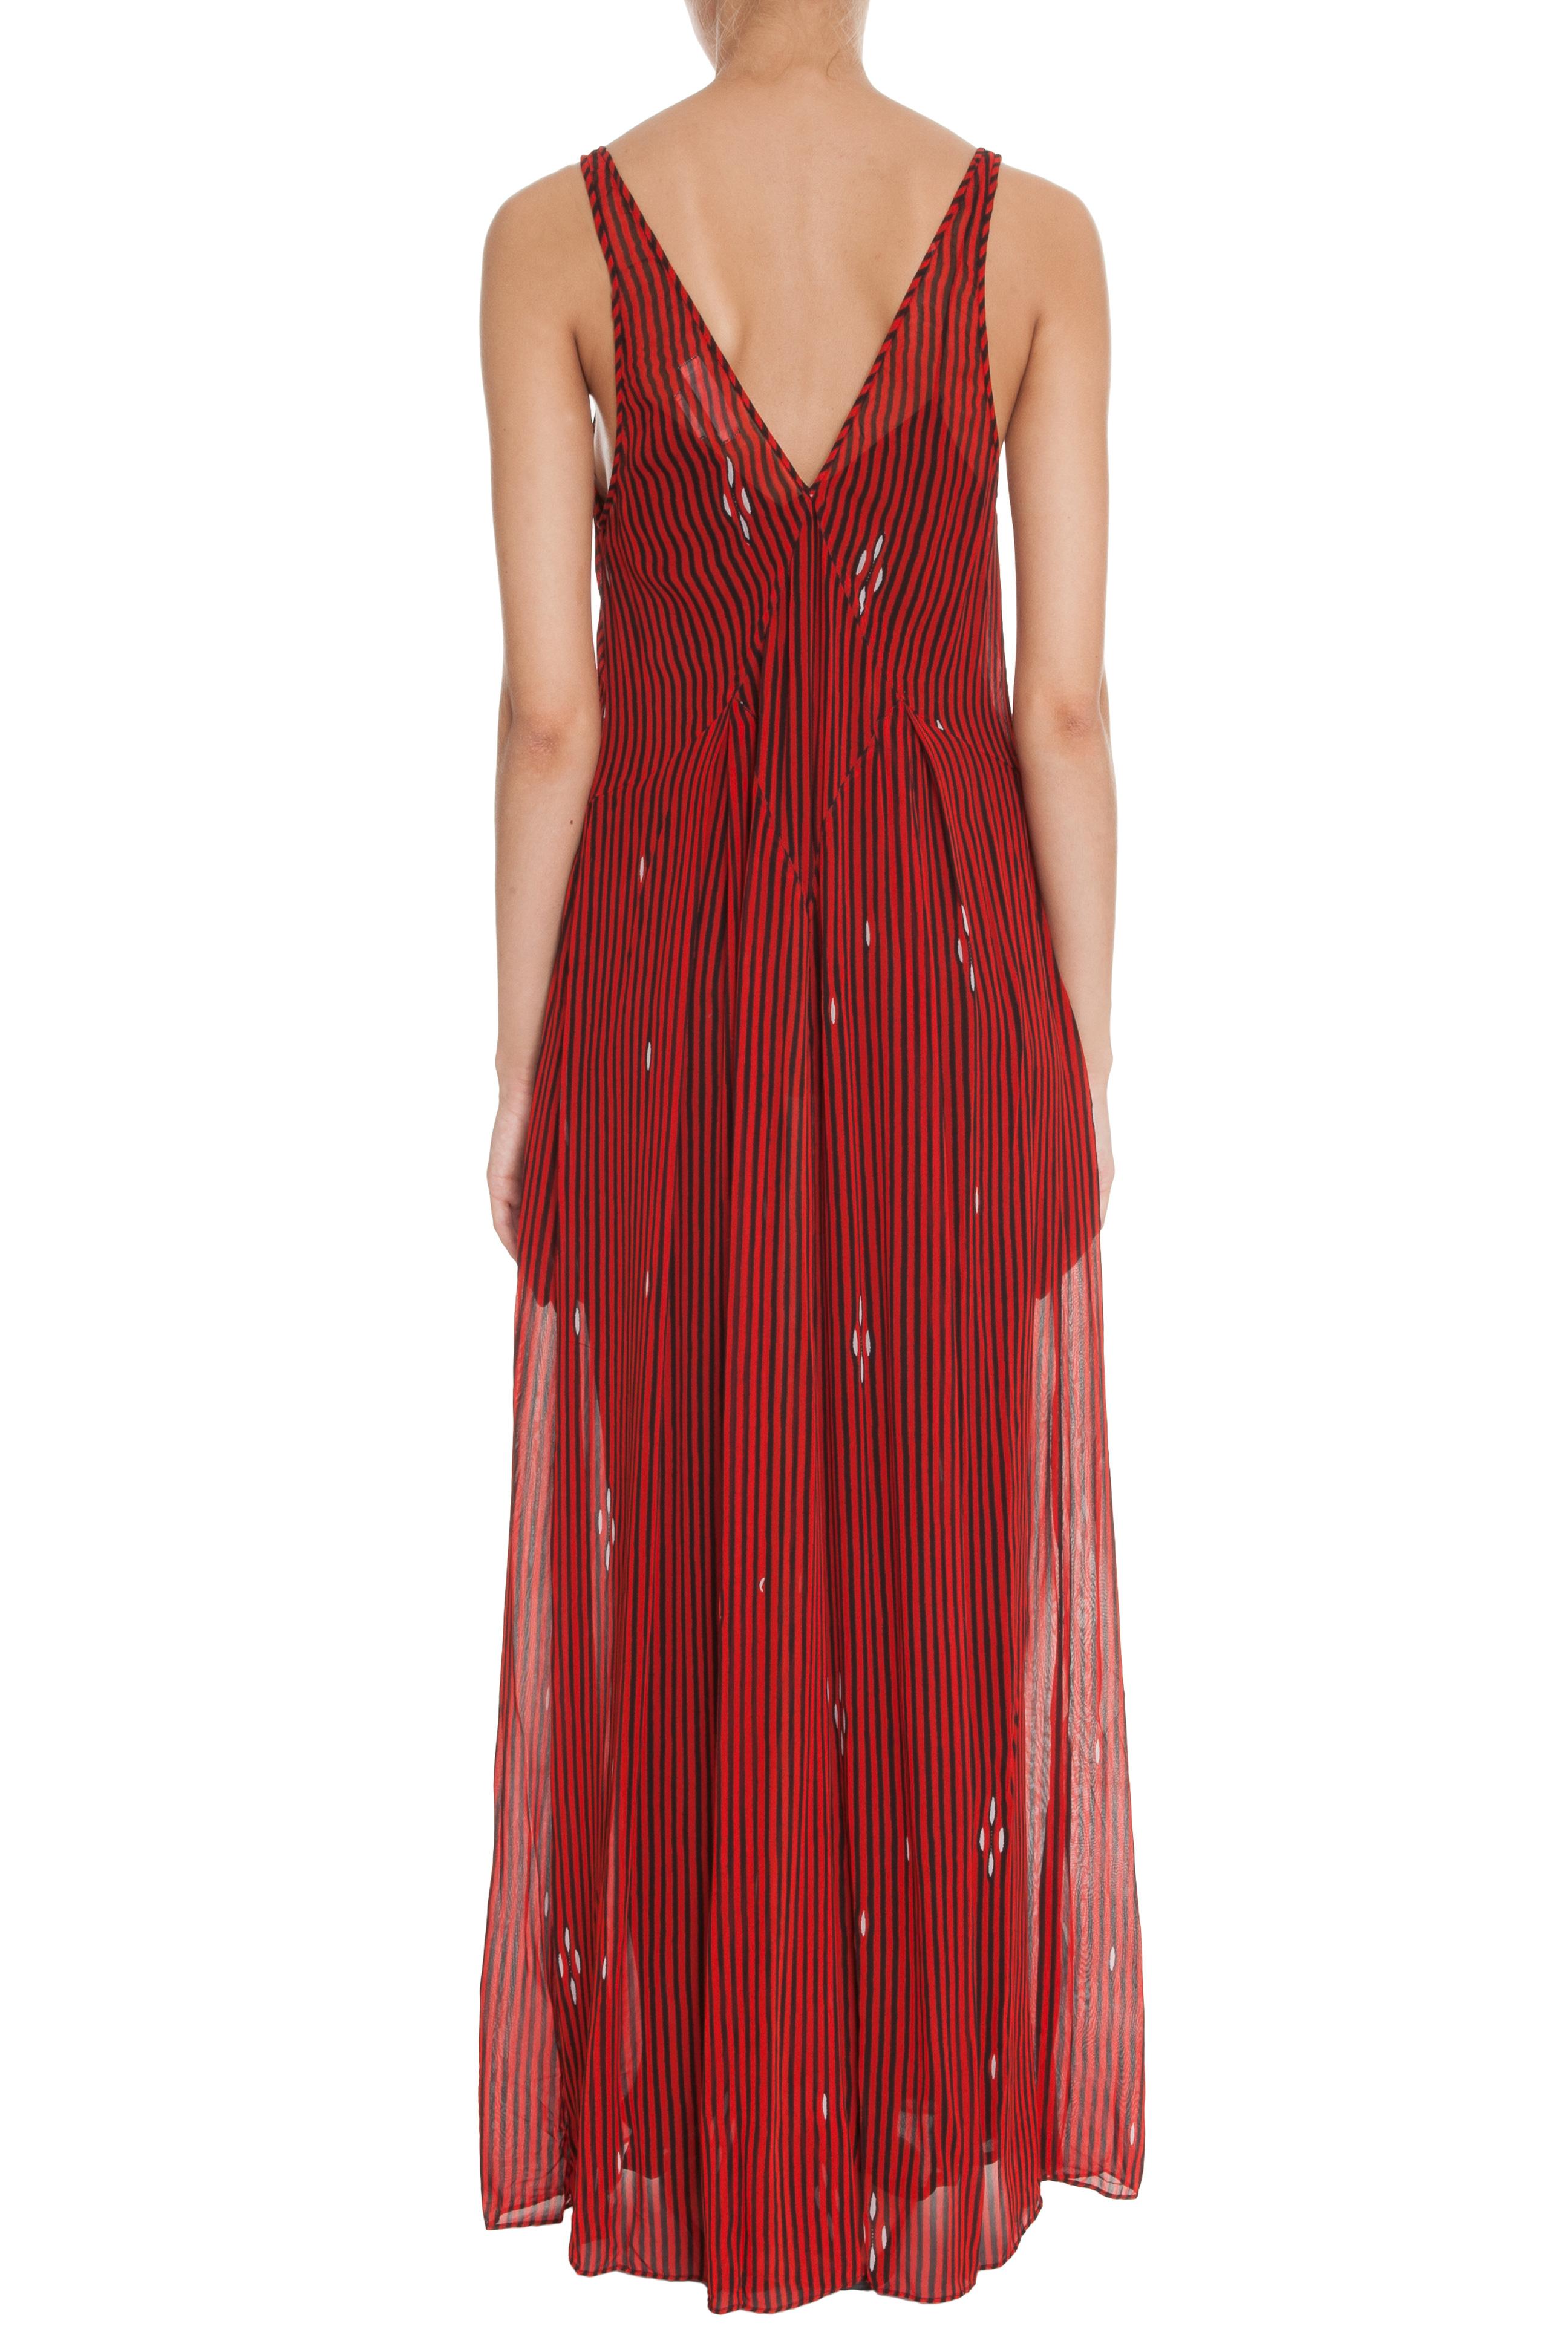 Cassidy maxi dress